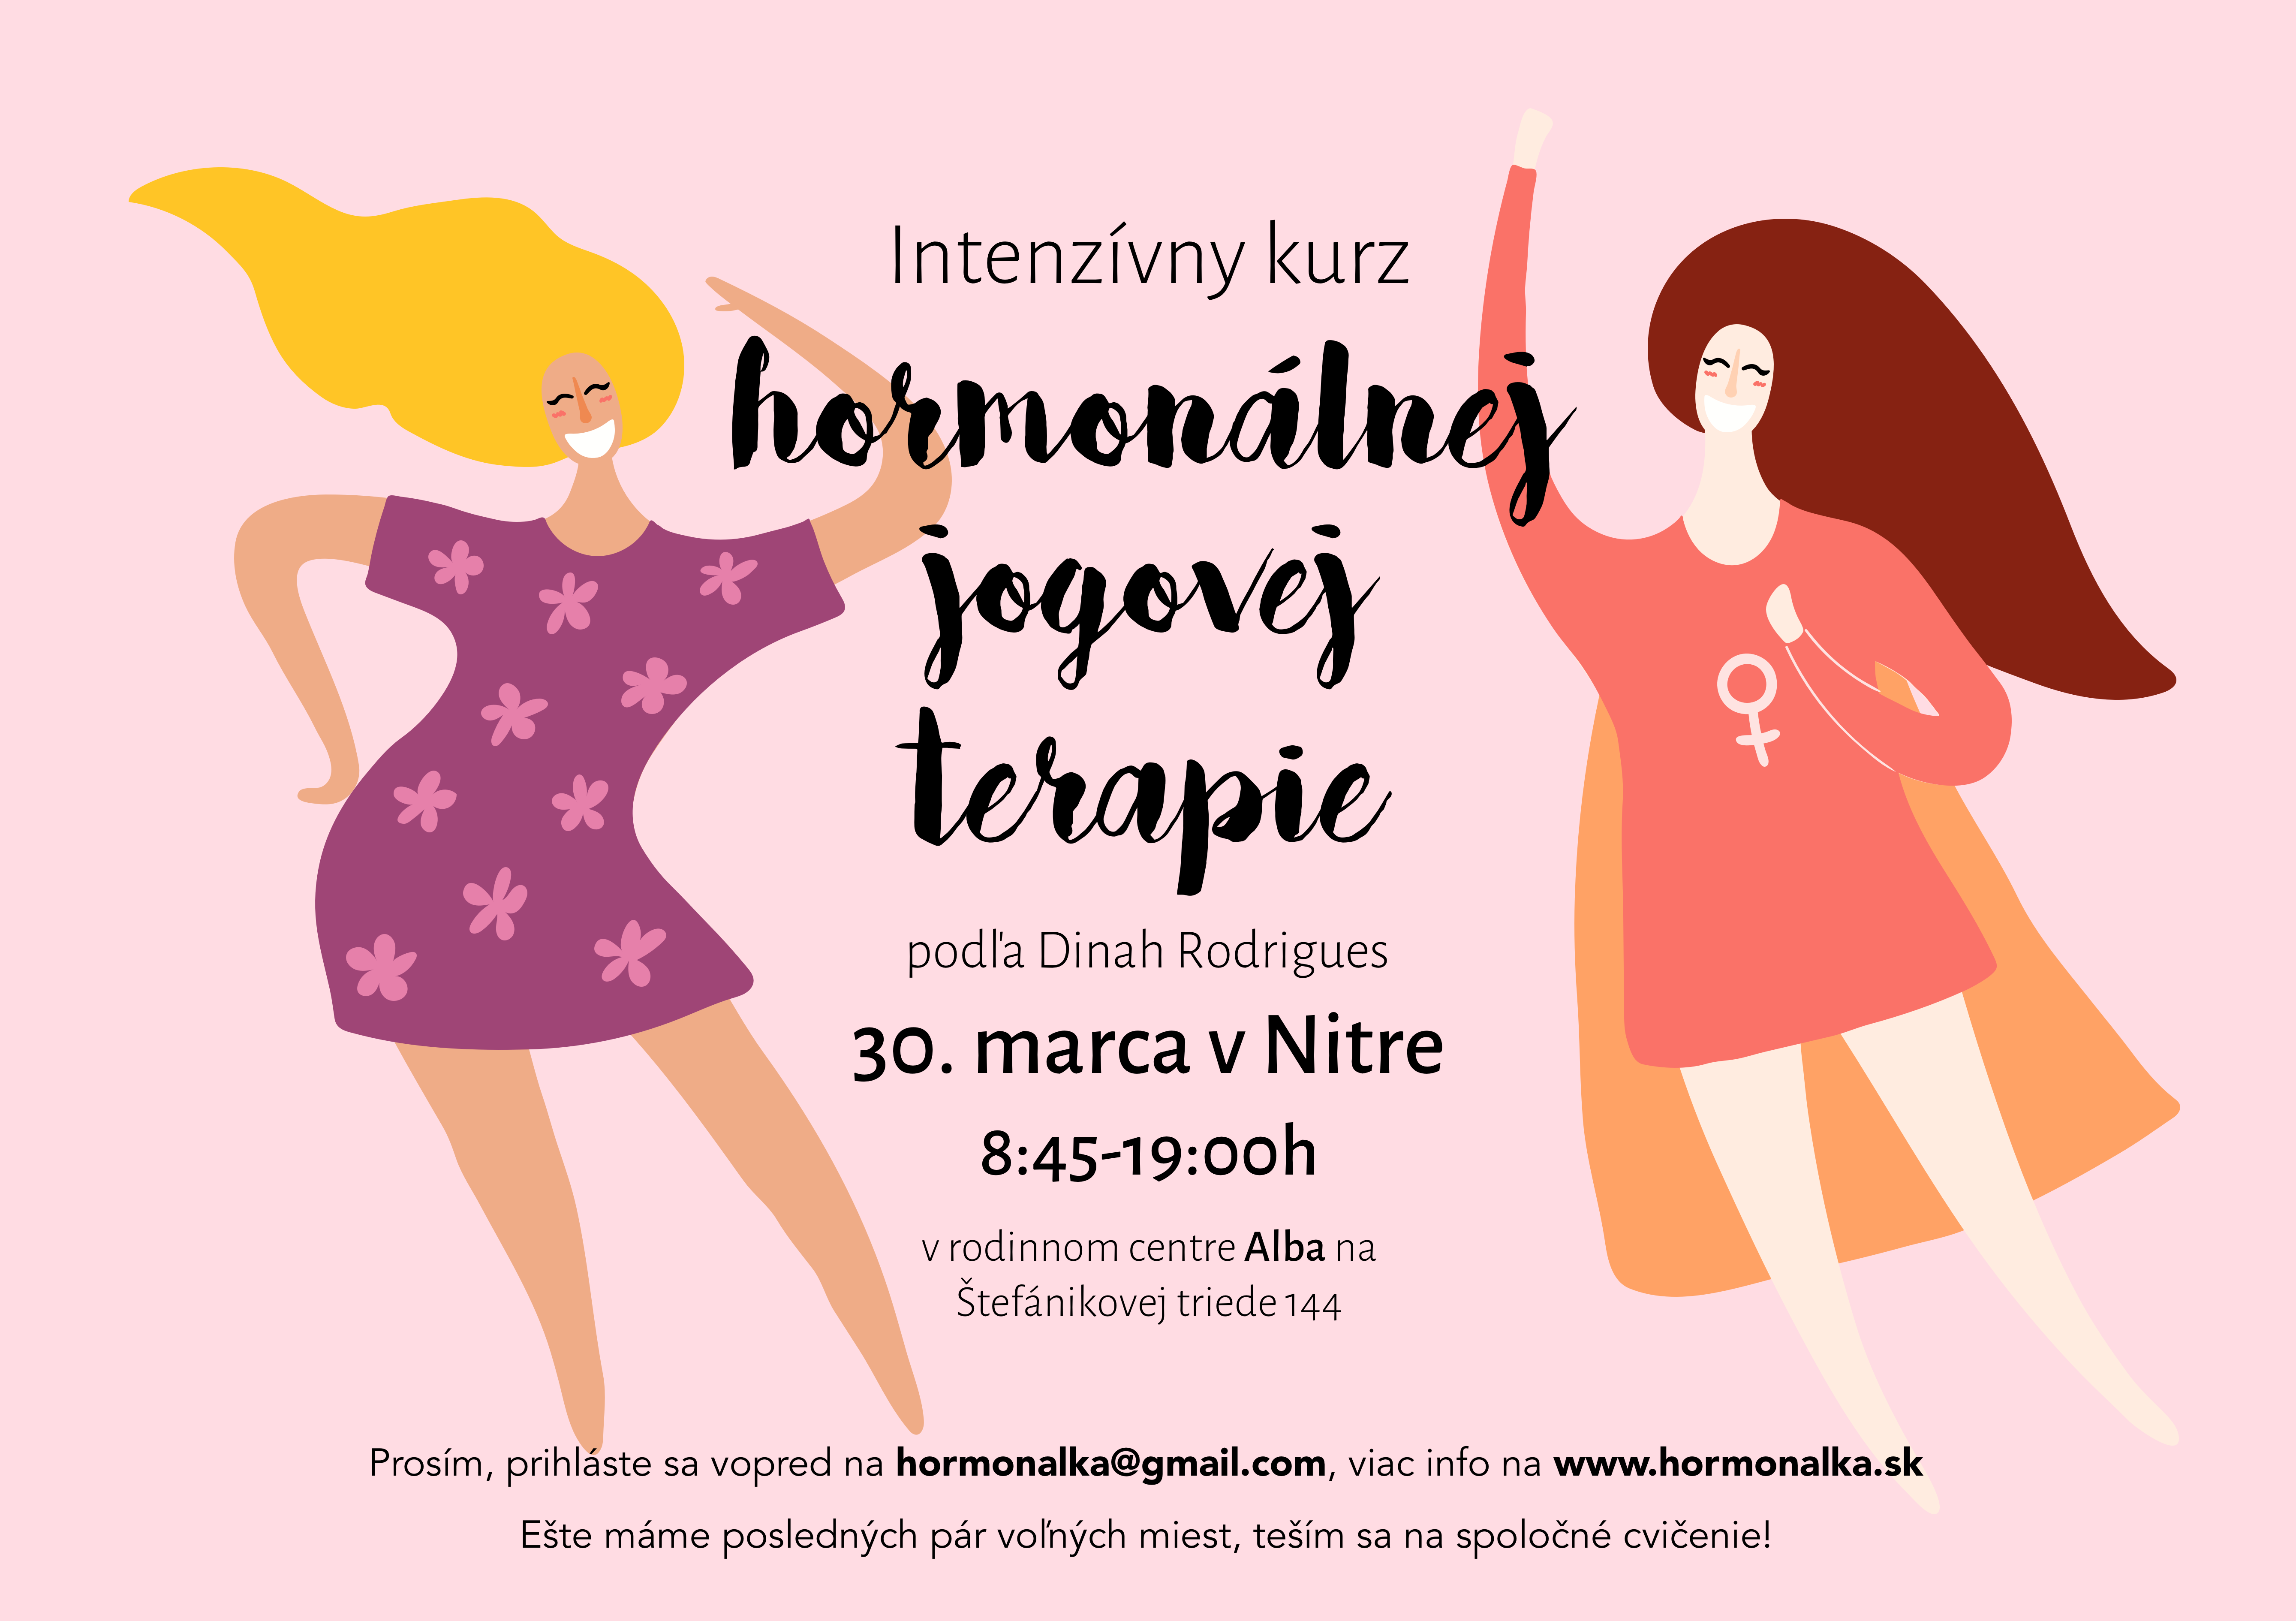 hormonalna-jogova-terapia-Nitra-intenzivny-kurz-sramkova